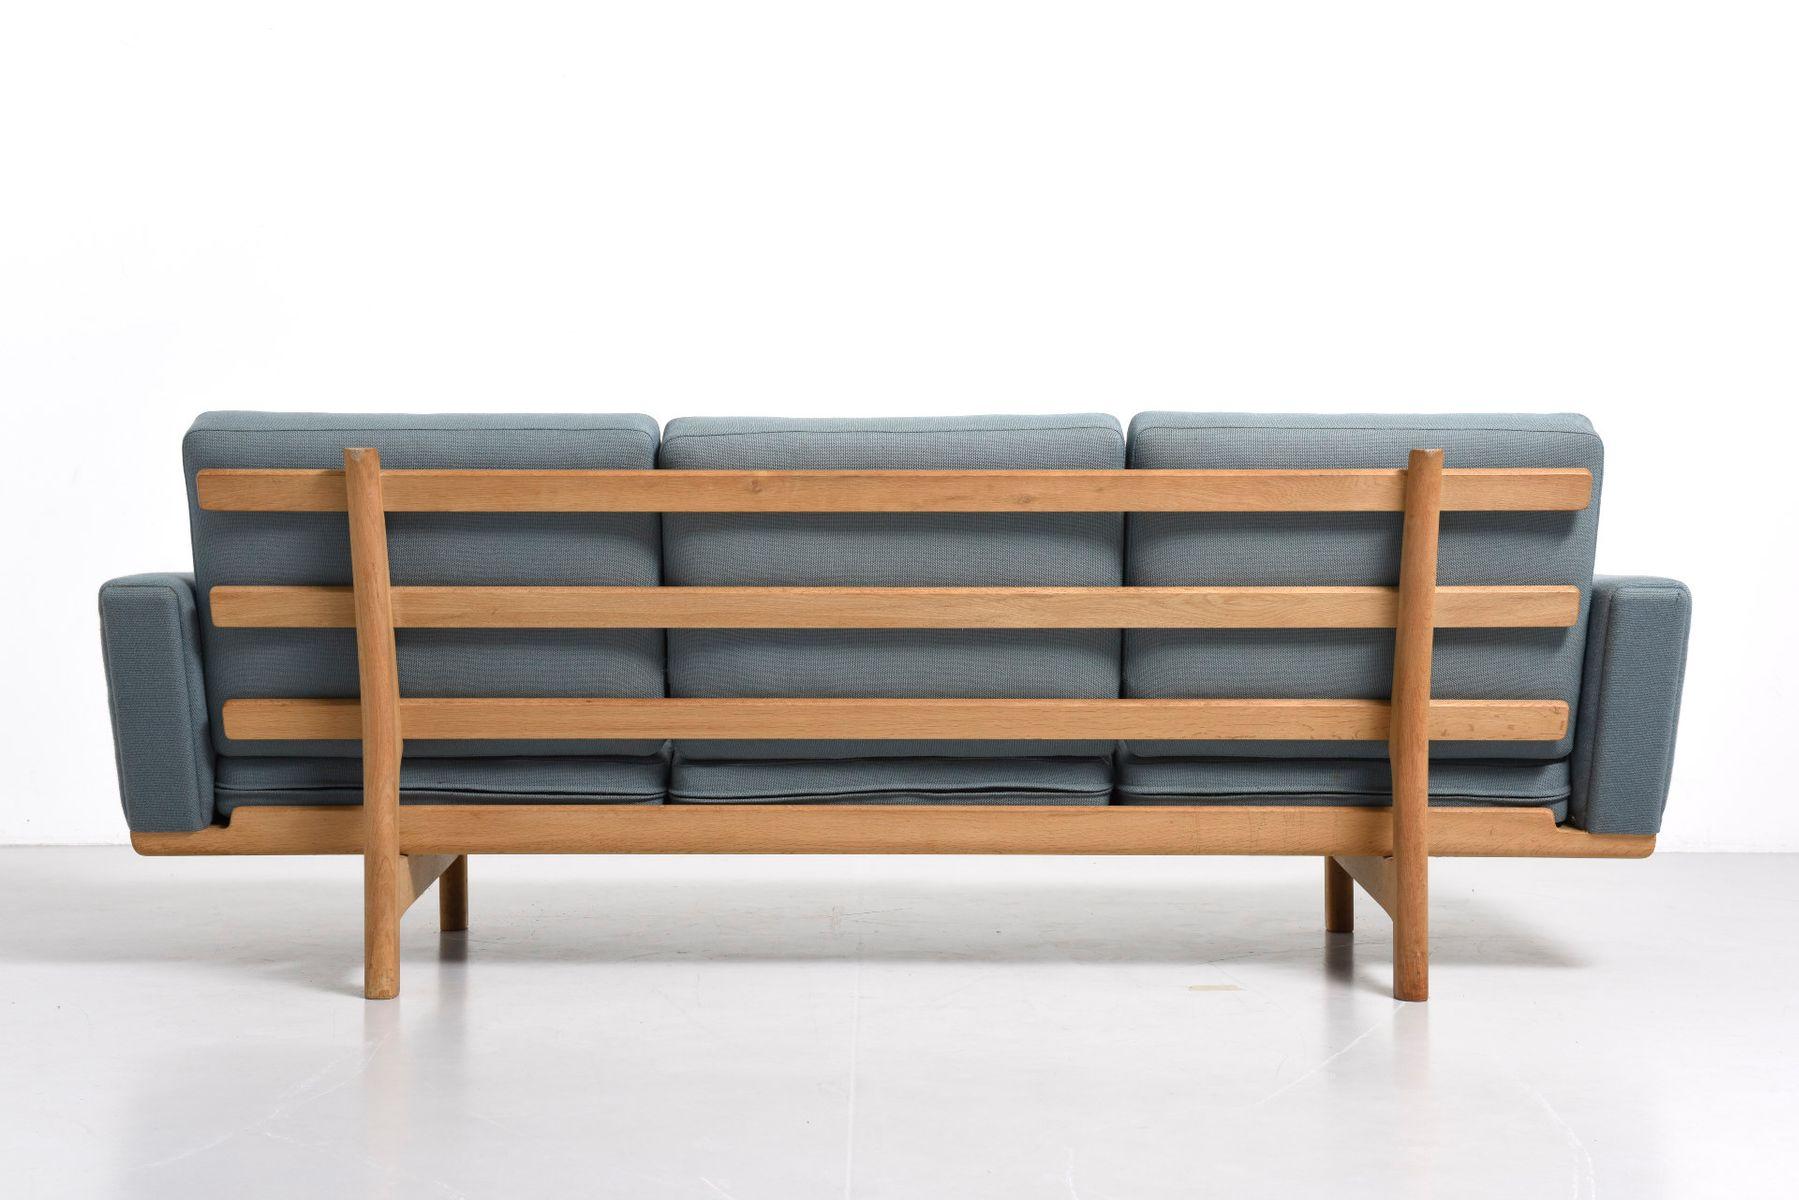 Enjoyable Hans Wegner Sofa Ge 236 Sofa Meederpremier Com Gmtry Best Dining Table And Chair Ideas Images Gmtryco